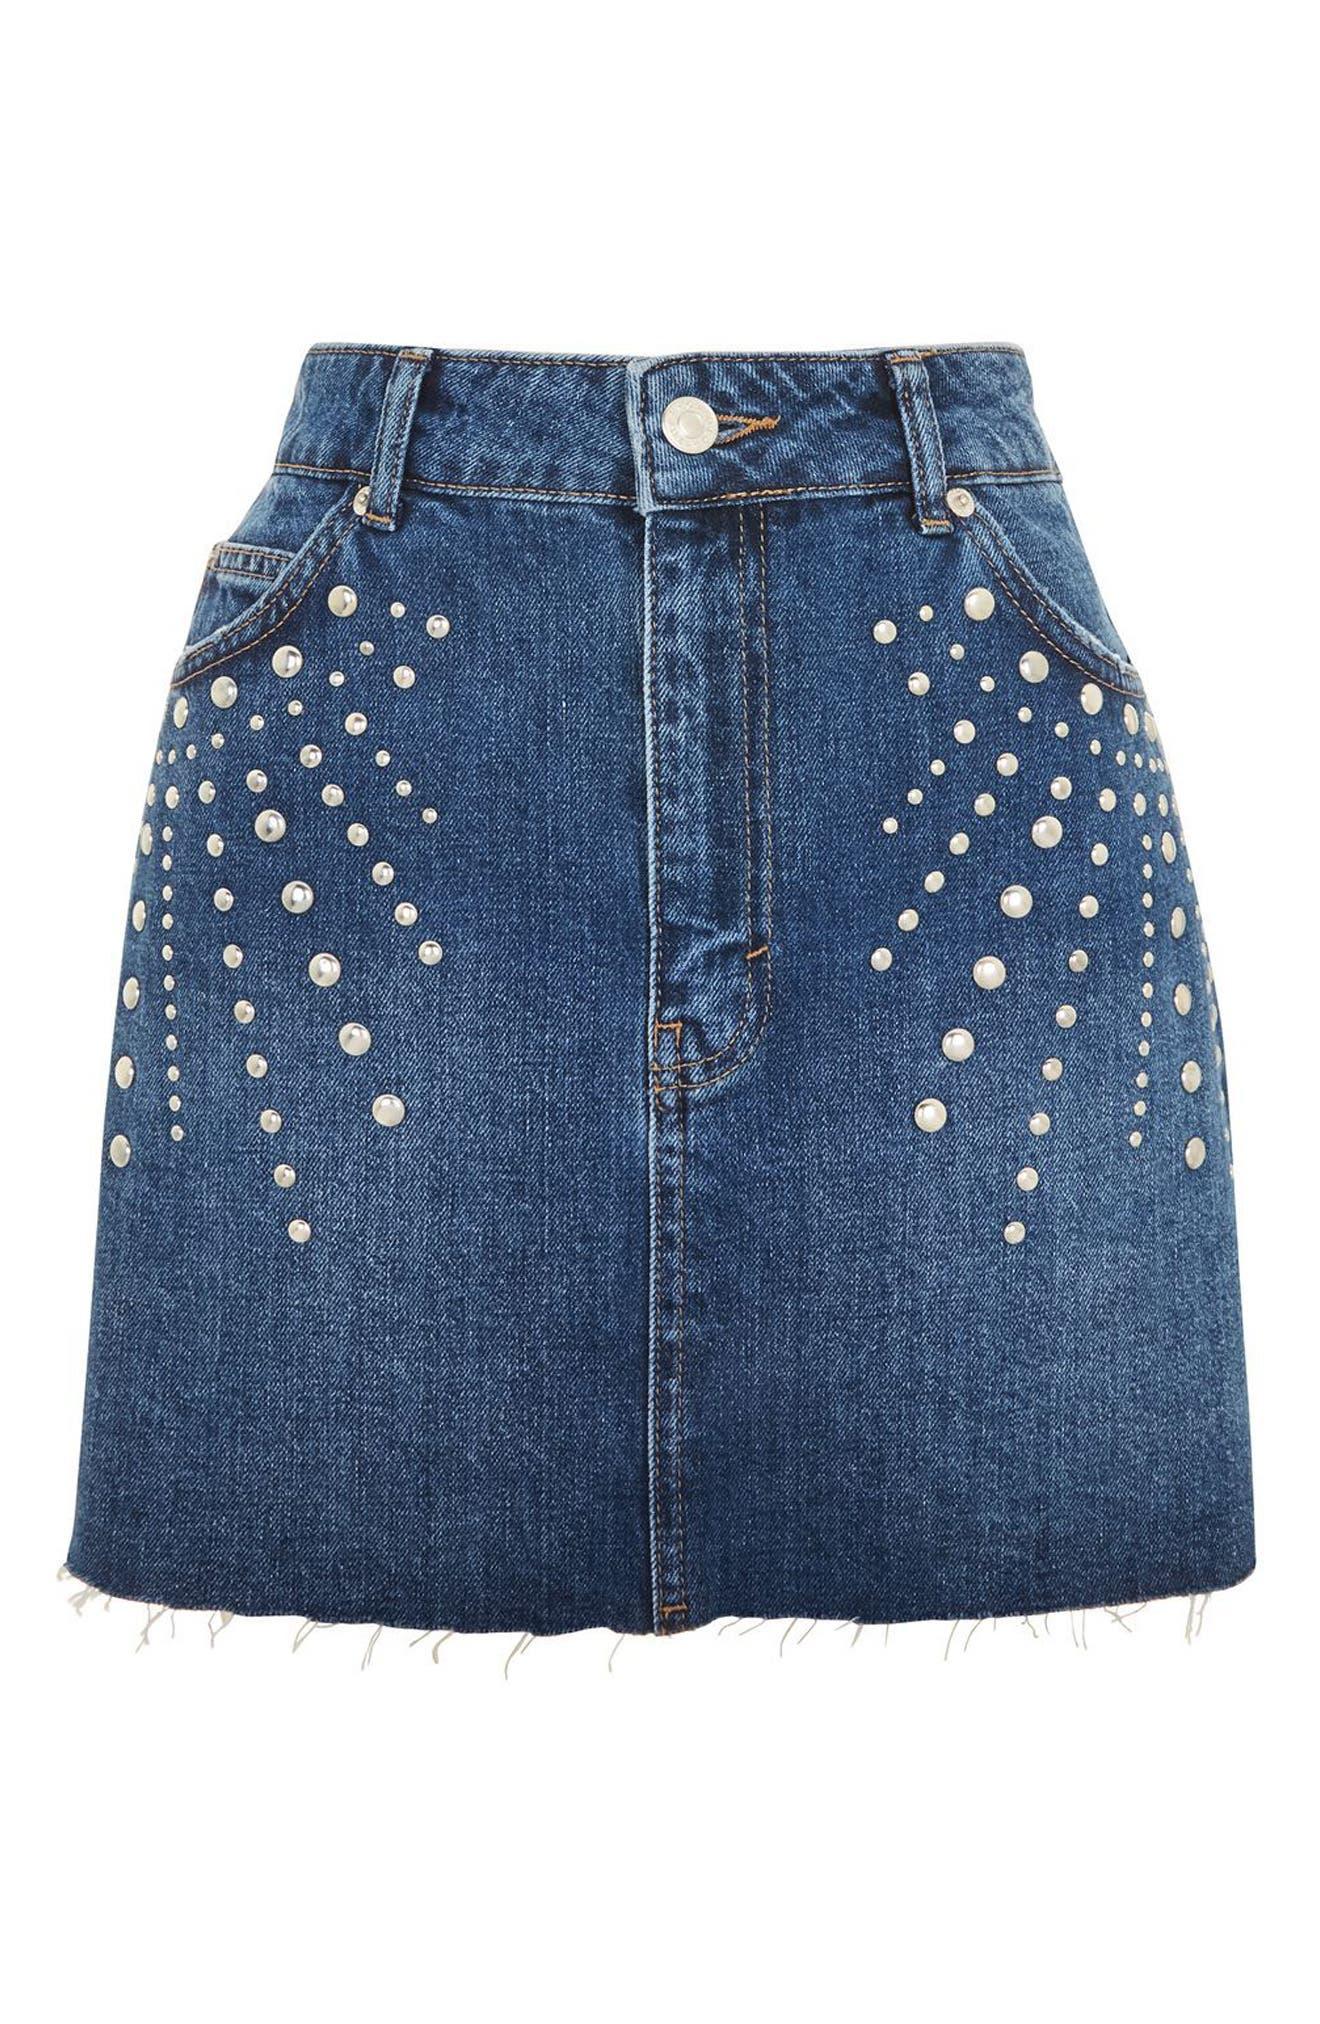 Spray Studded Denim Skirt,                             Main thumbnail 1, color,                             Mid Denim